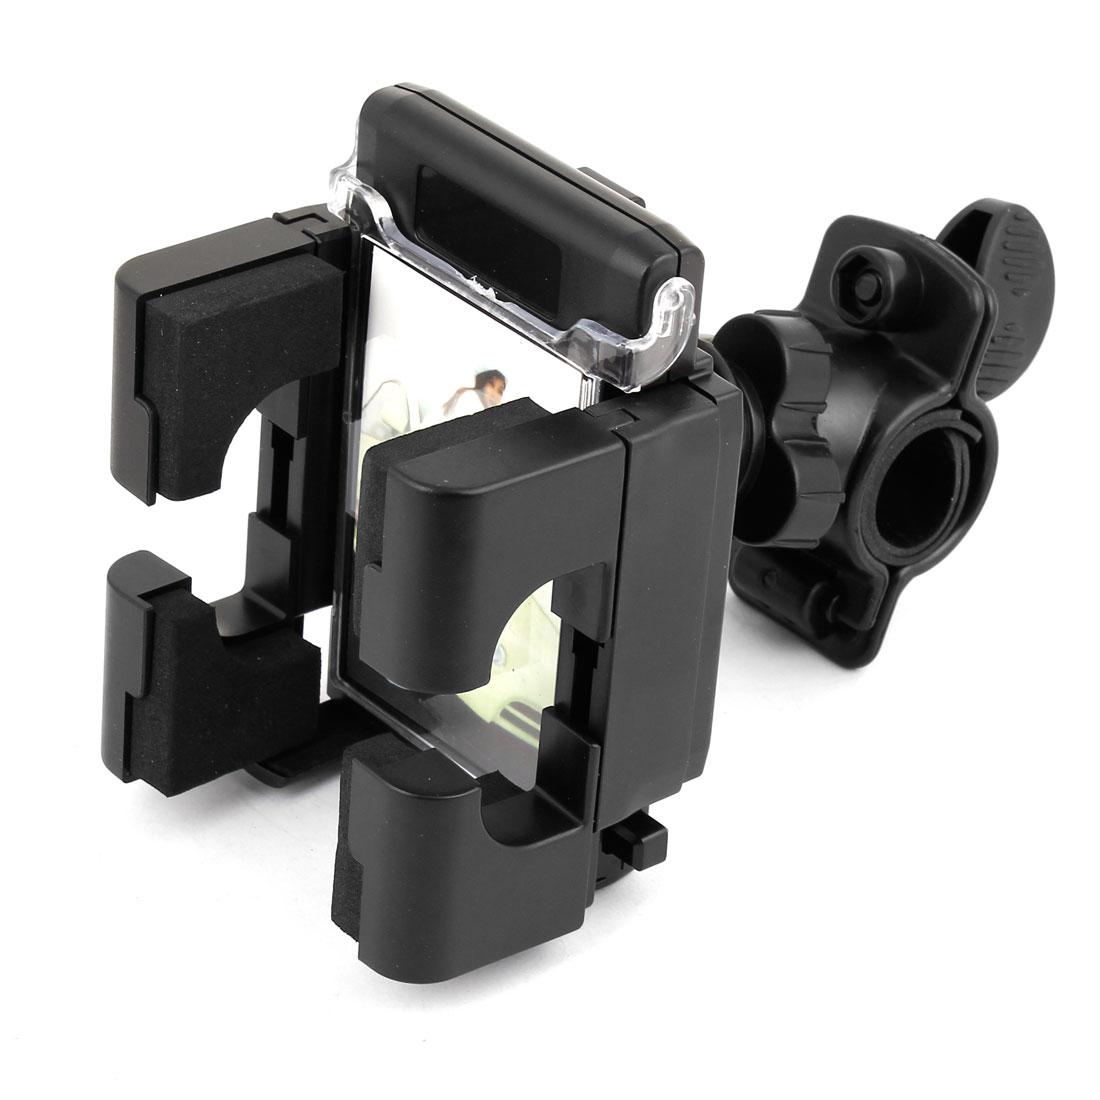 Black Hard Plastic 360 Degrees Rotating Antiskid Car GPS MP3 Phone Holder